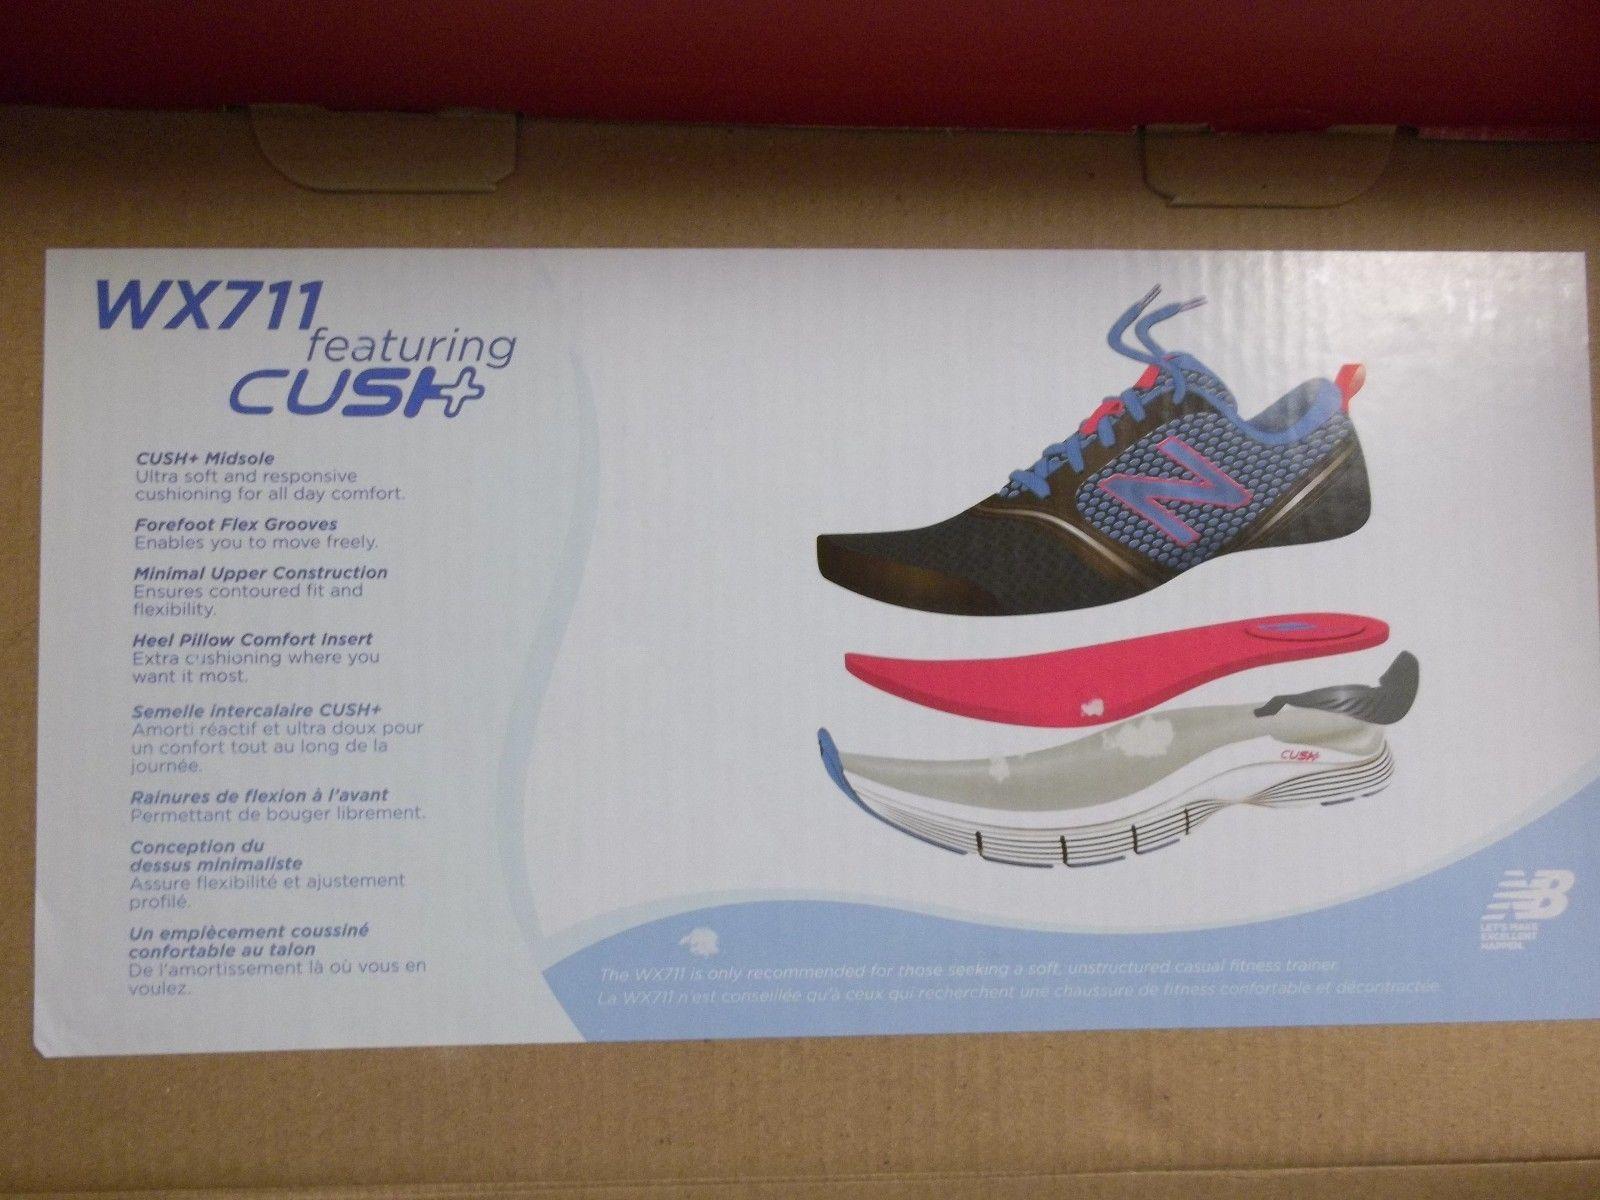 New Balance Sze 7 M 711 WX711HD Green Running Training Sneakers New Womens Shoes